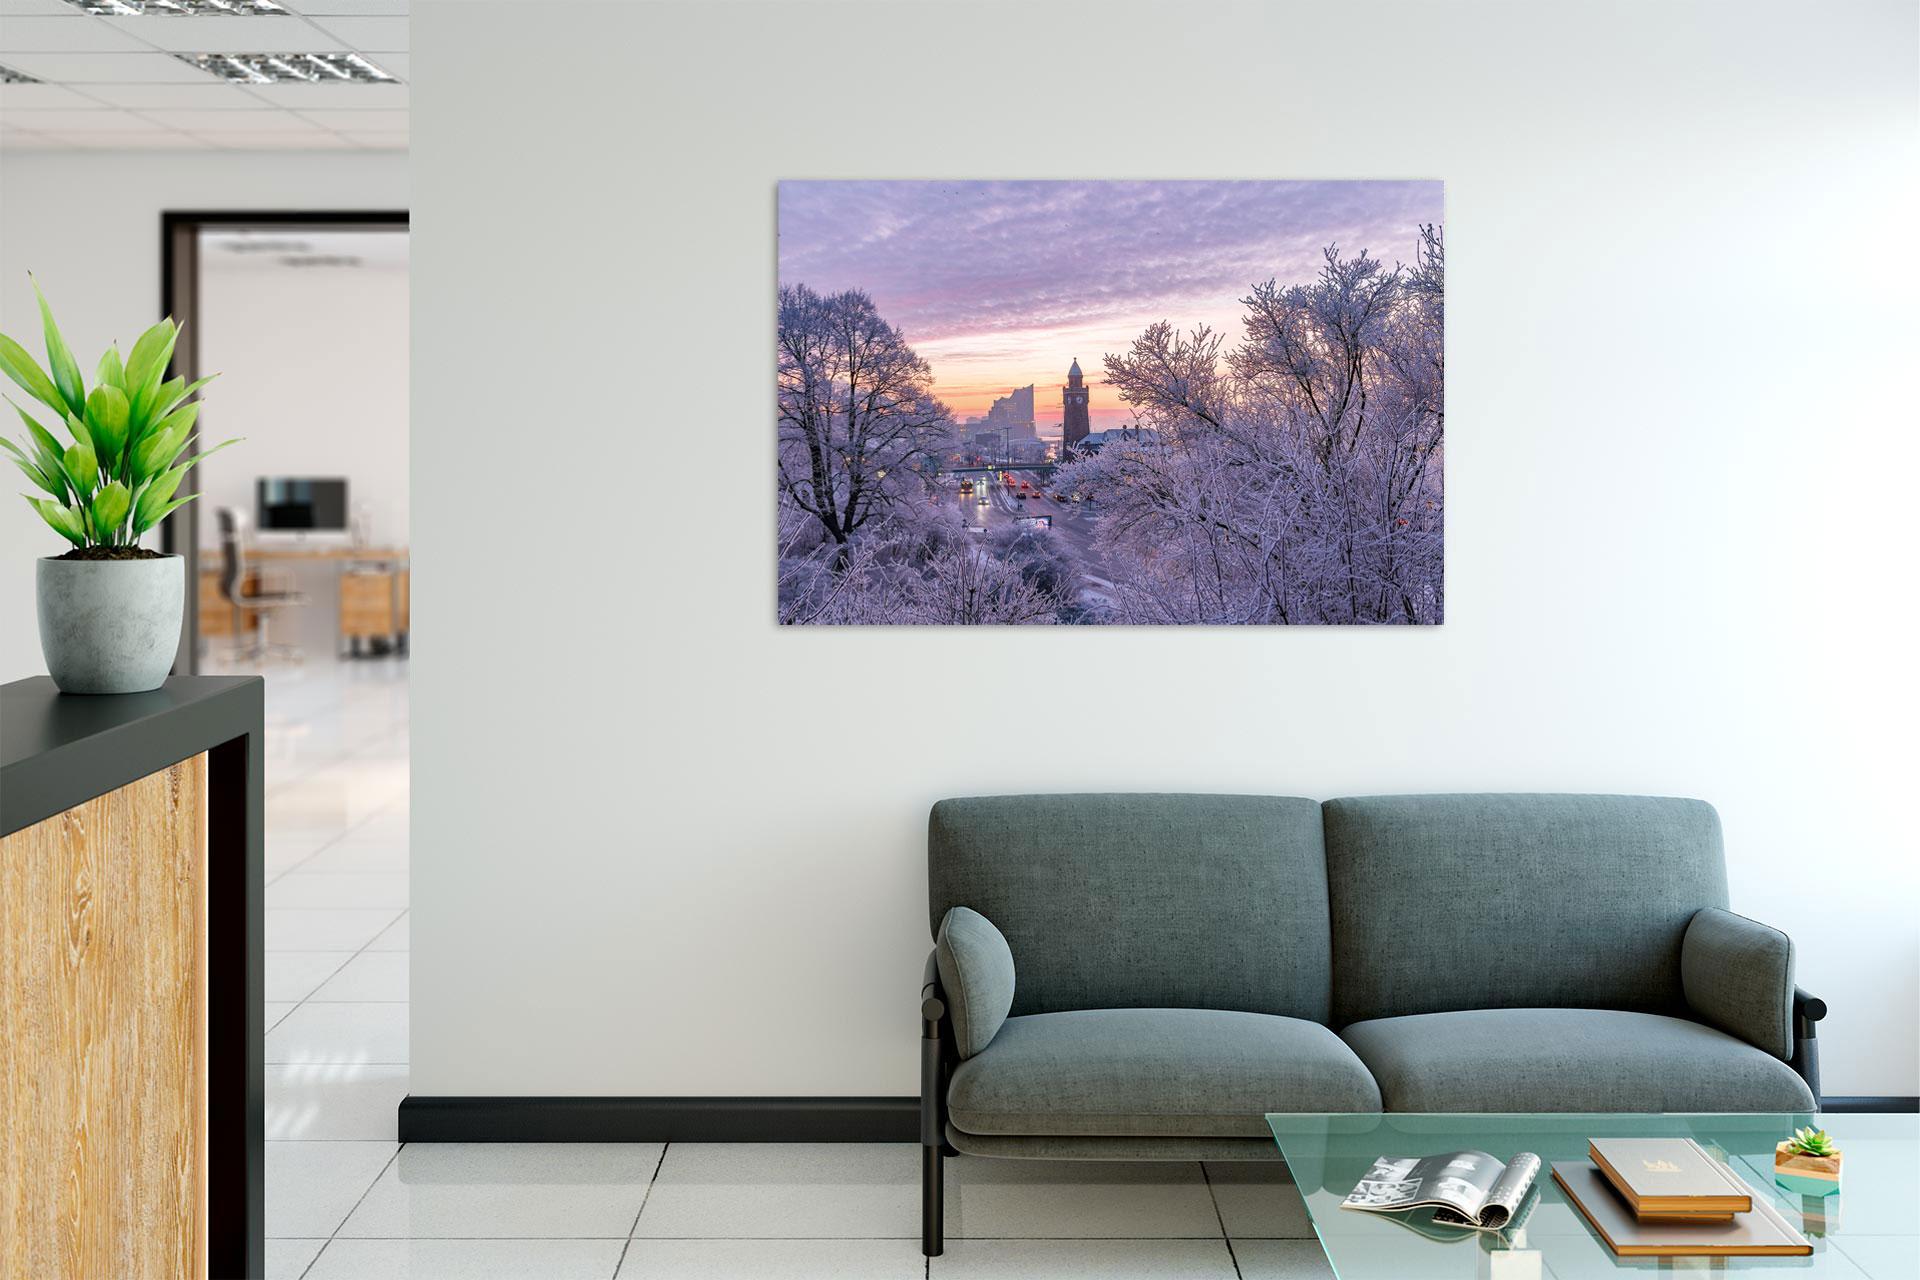 NL086-wintermaerchen-hamburg-wandbild-bild-auf-leinwand-acrylglas-aludibond-empfang